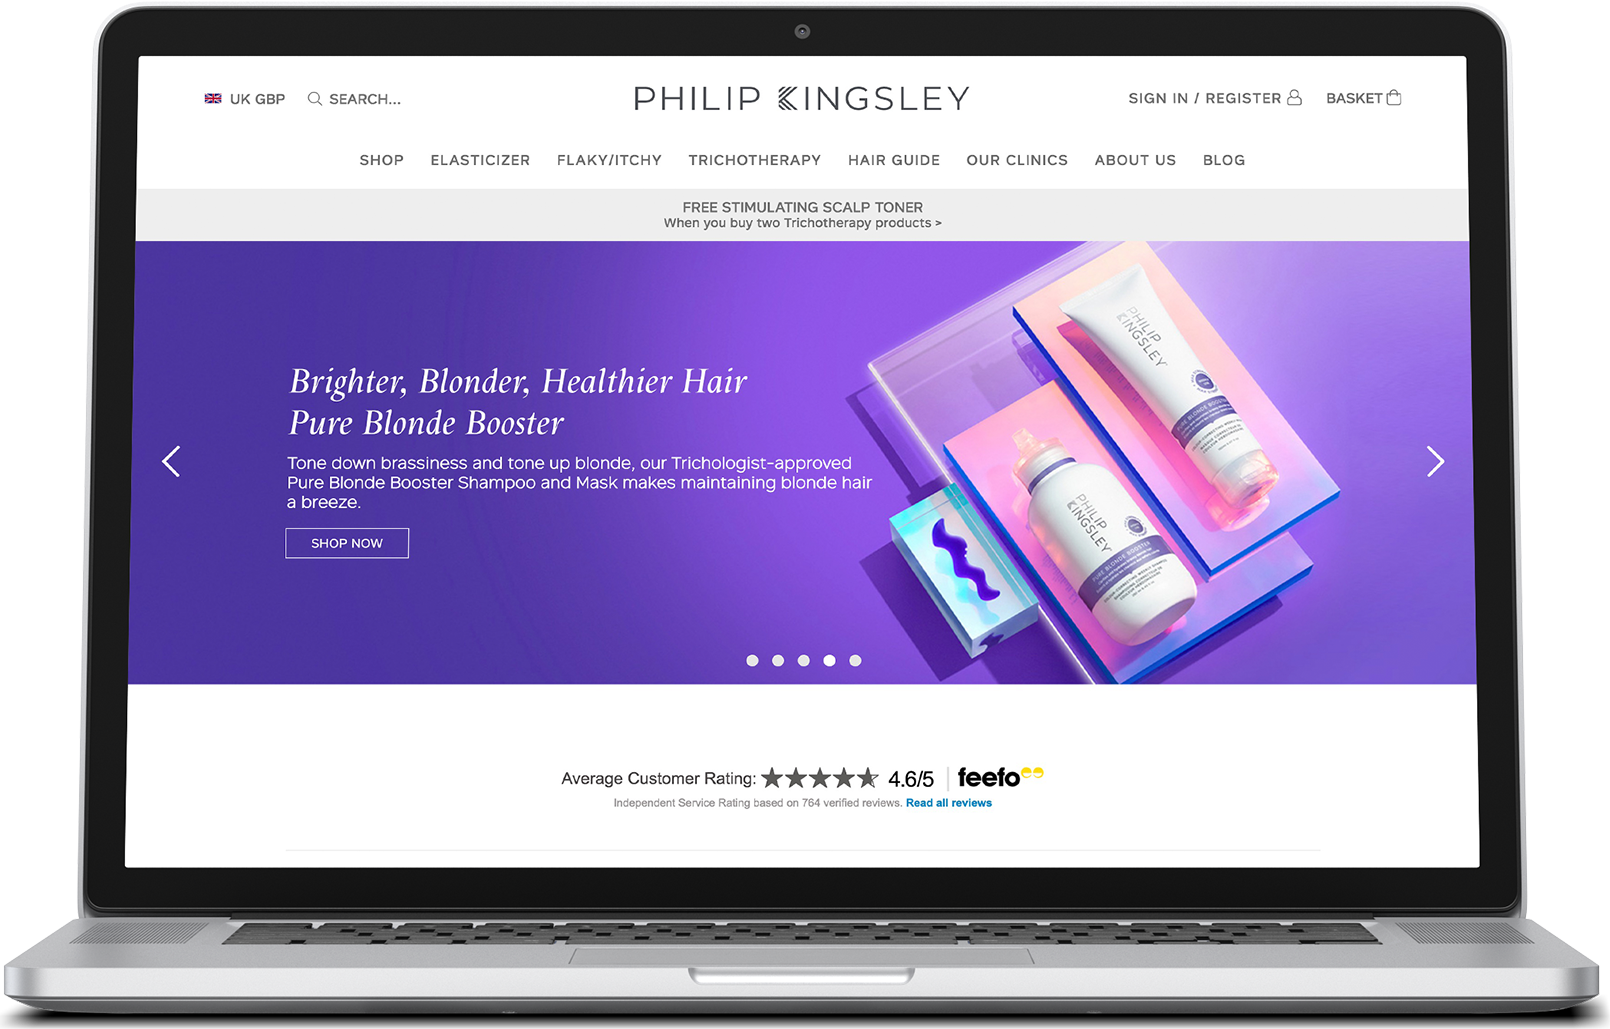 Philip Kingsley Case Study desktop